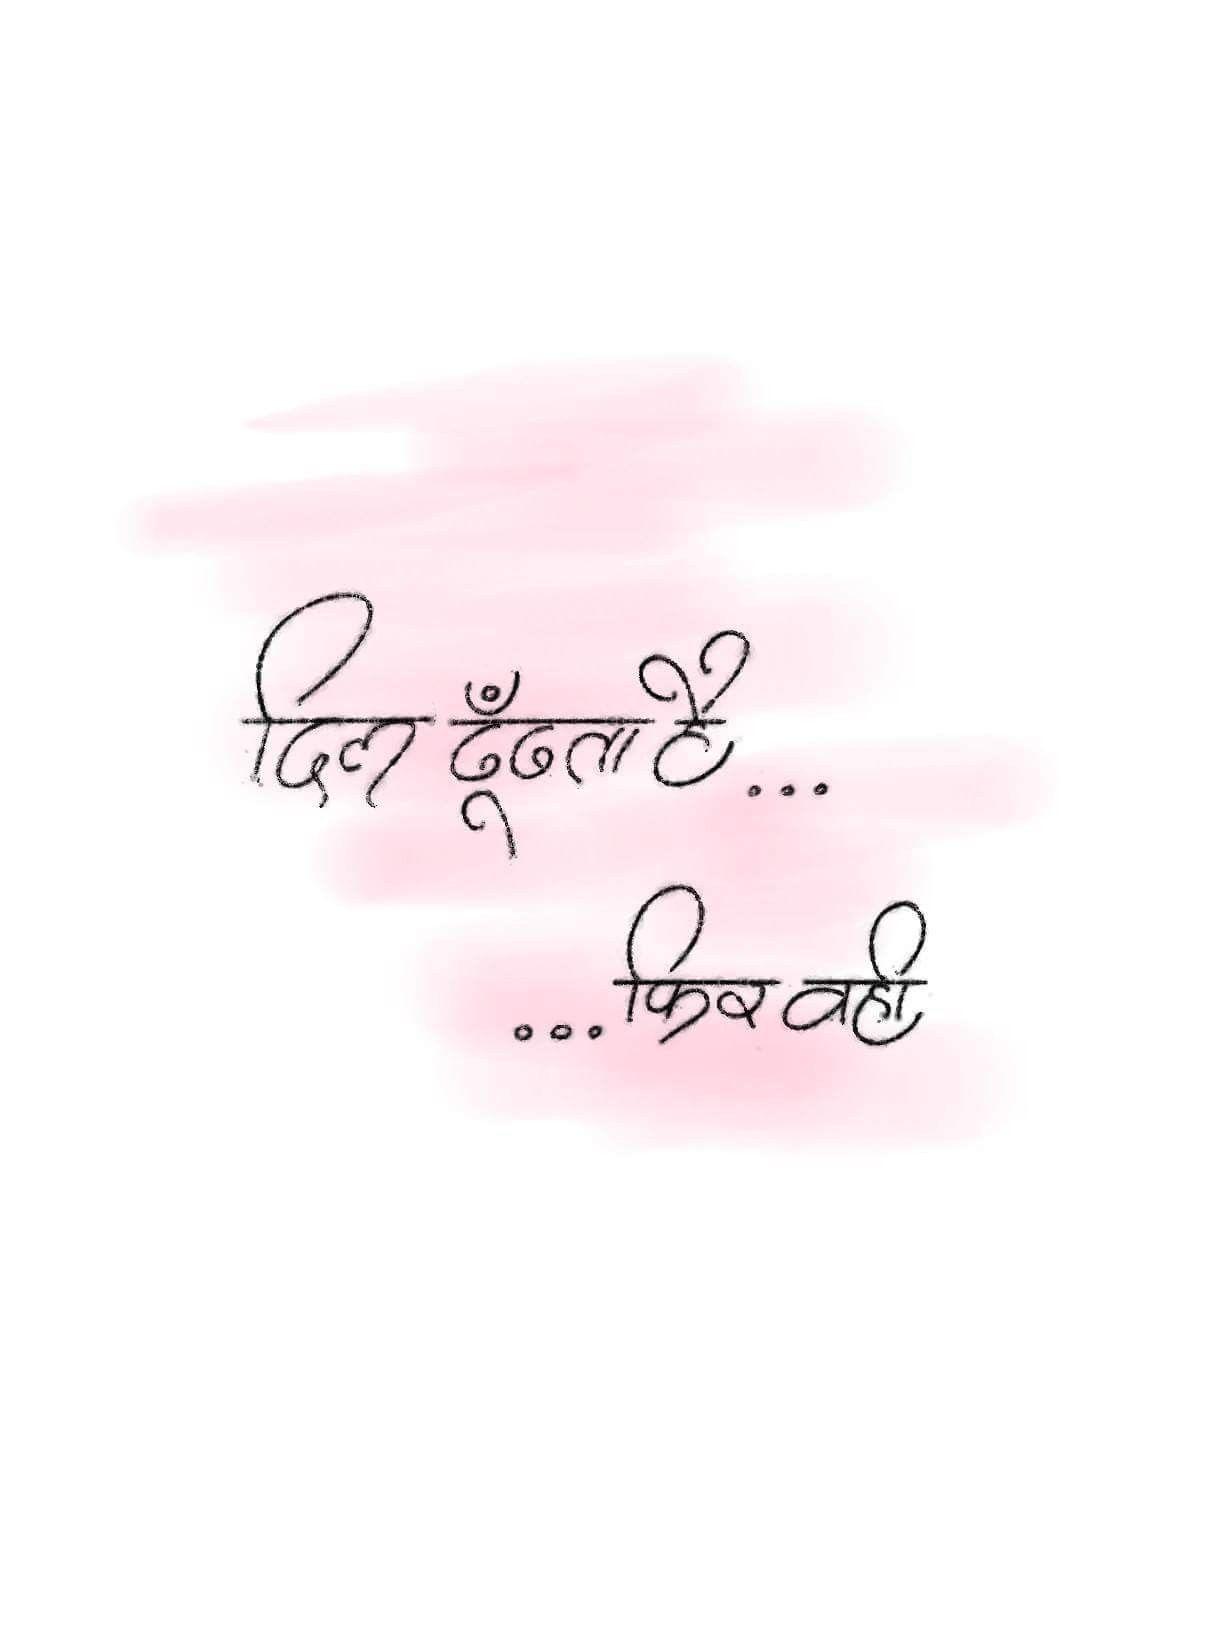 Pin By Shripada Tembhurne Kelkar On Lyrics Best Lyrics Quotes Single Line Quotes Bollywood Quotes The windmills of your mind (the thomas crown affair). best lyrics quotes single line quotes